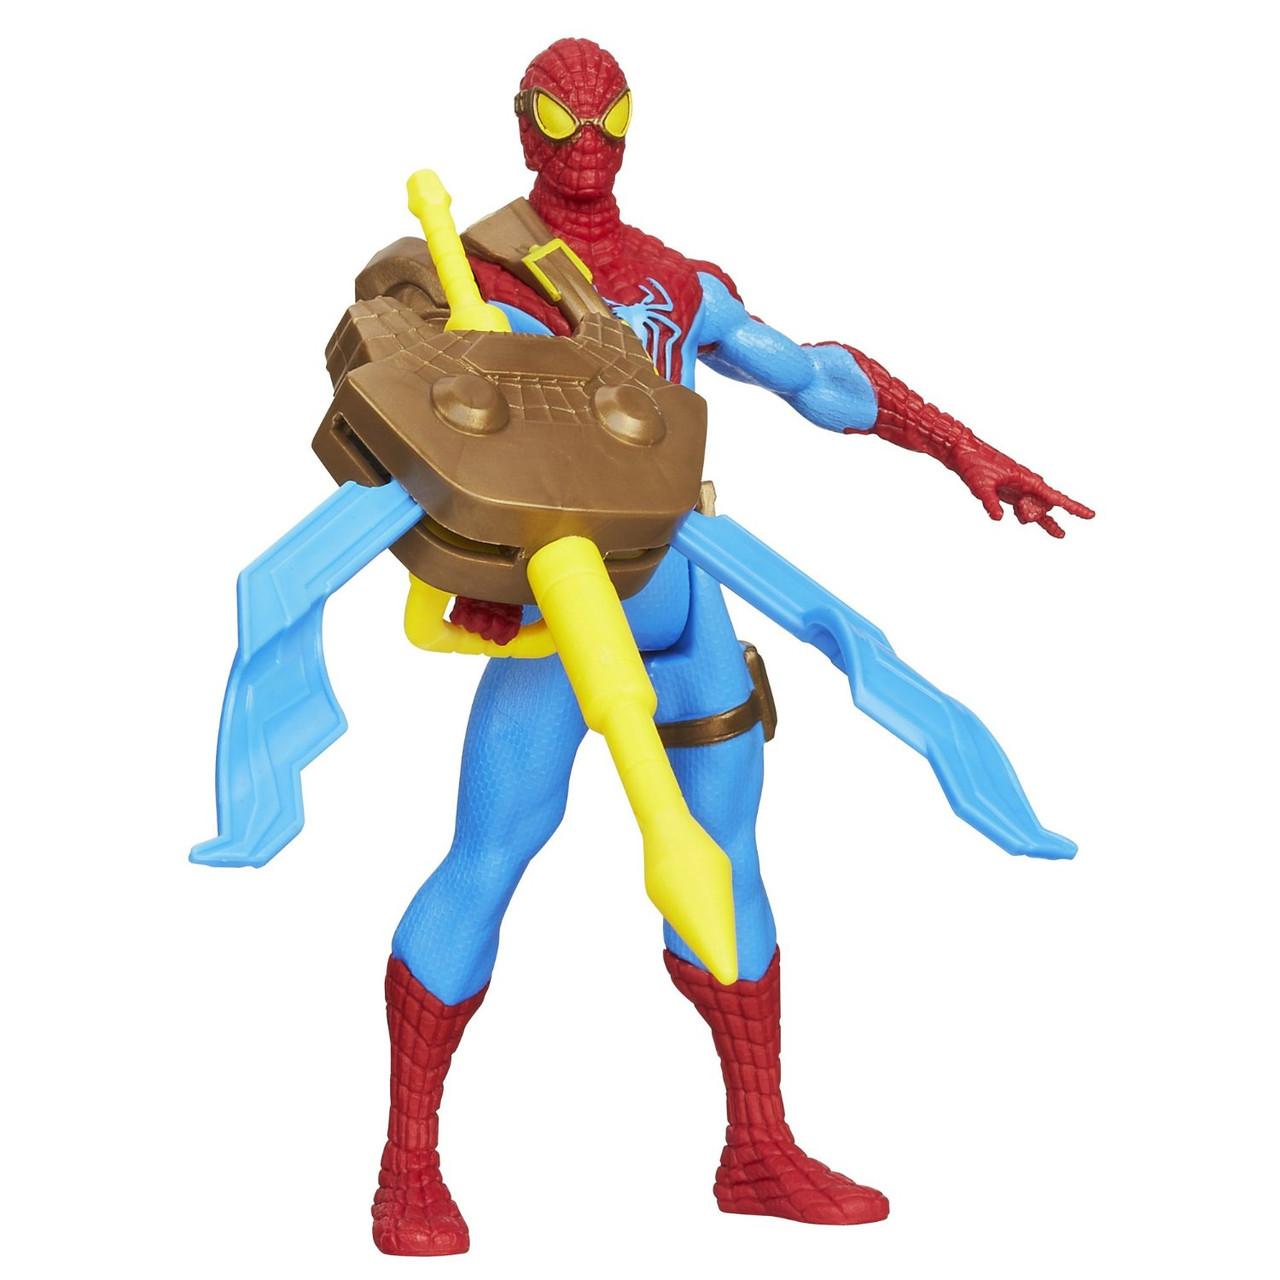 Фигурка Марвел Спайдермен Человек паук и его меч стрела (Marvel Amazing Spider-Man 2 Spider Strike Blade Arrow